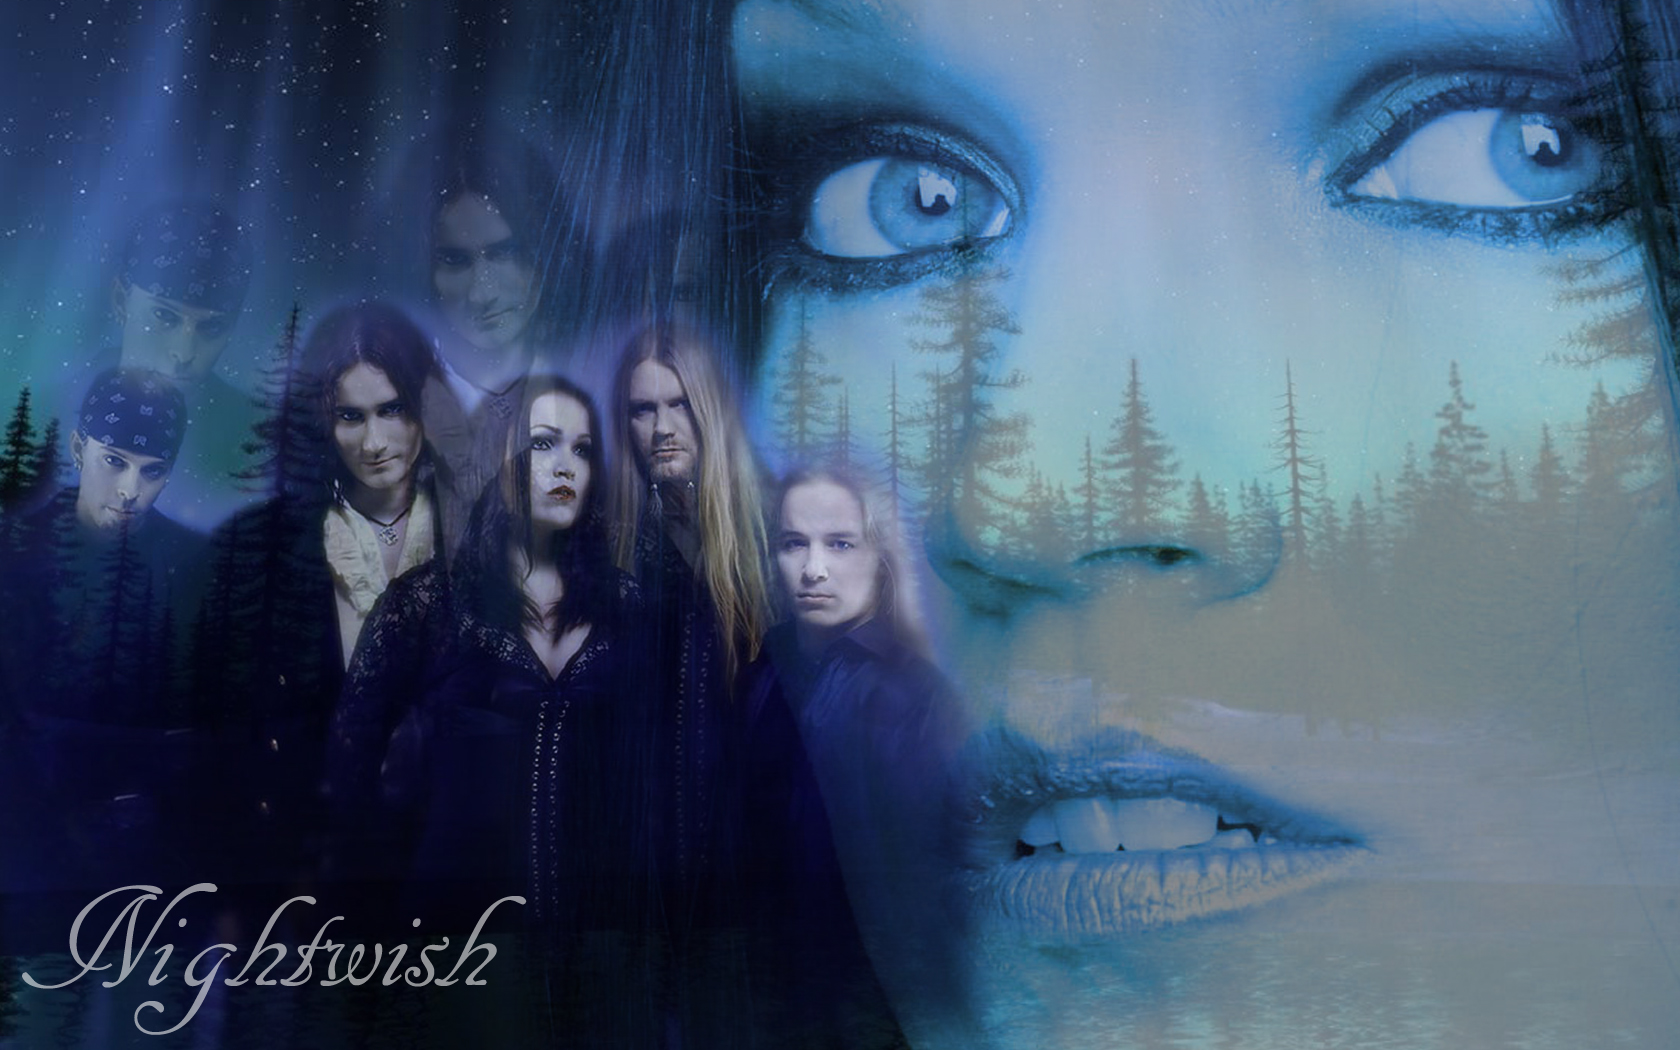 Nightwish Wallpaper And Hintergrund 1680x1050 Id 195211